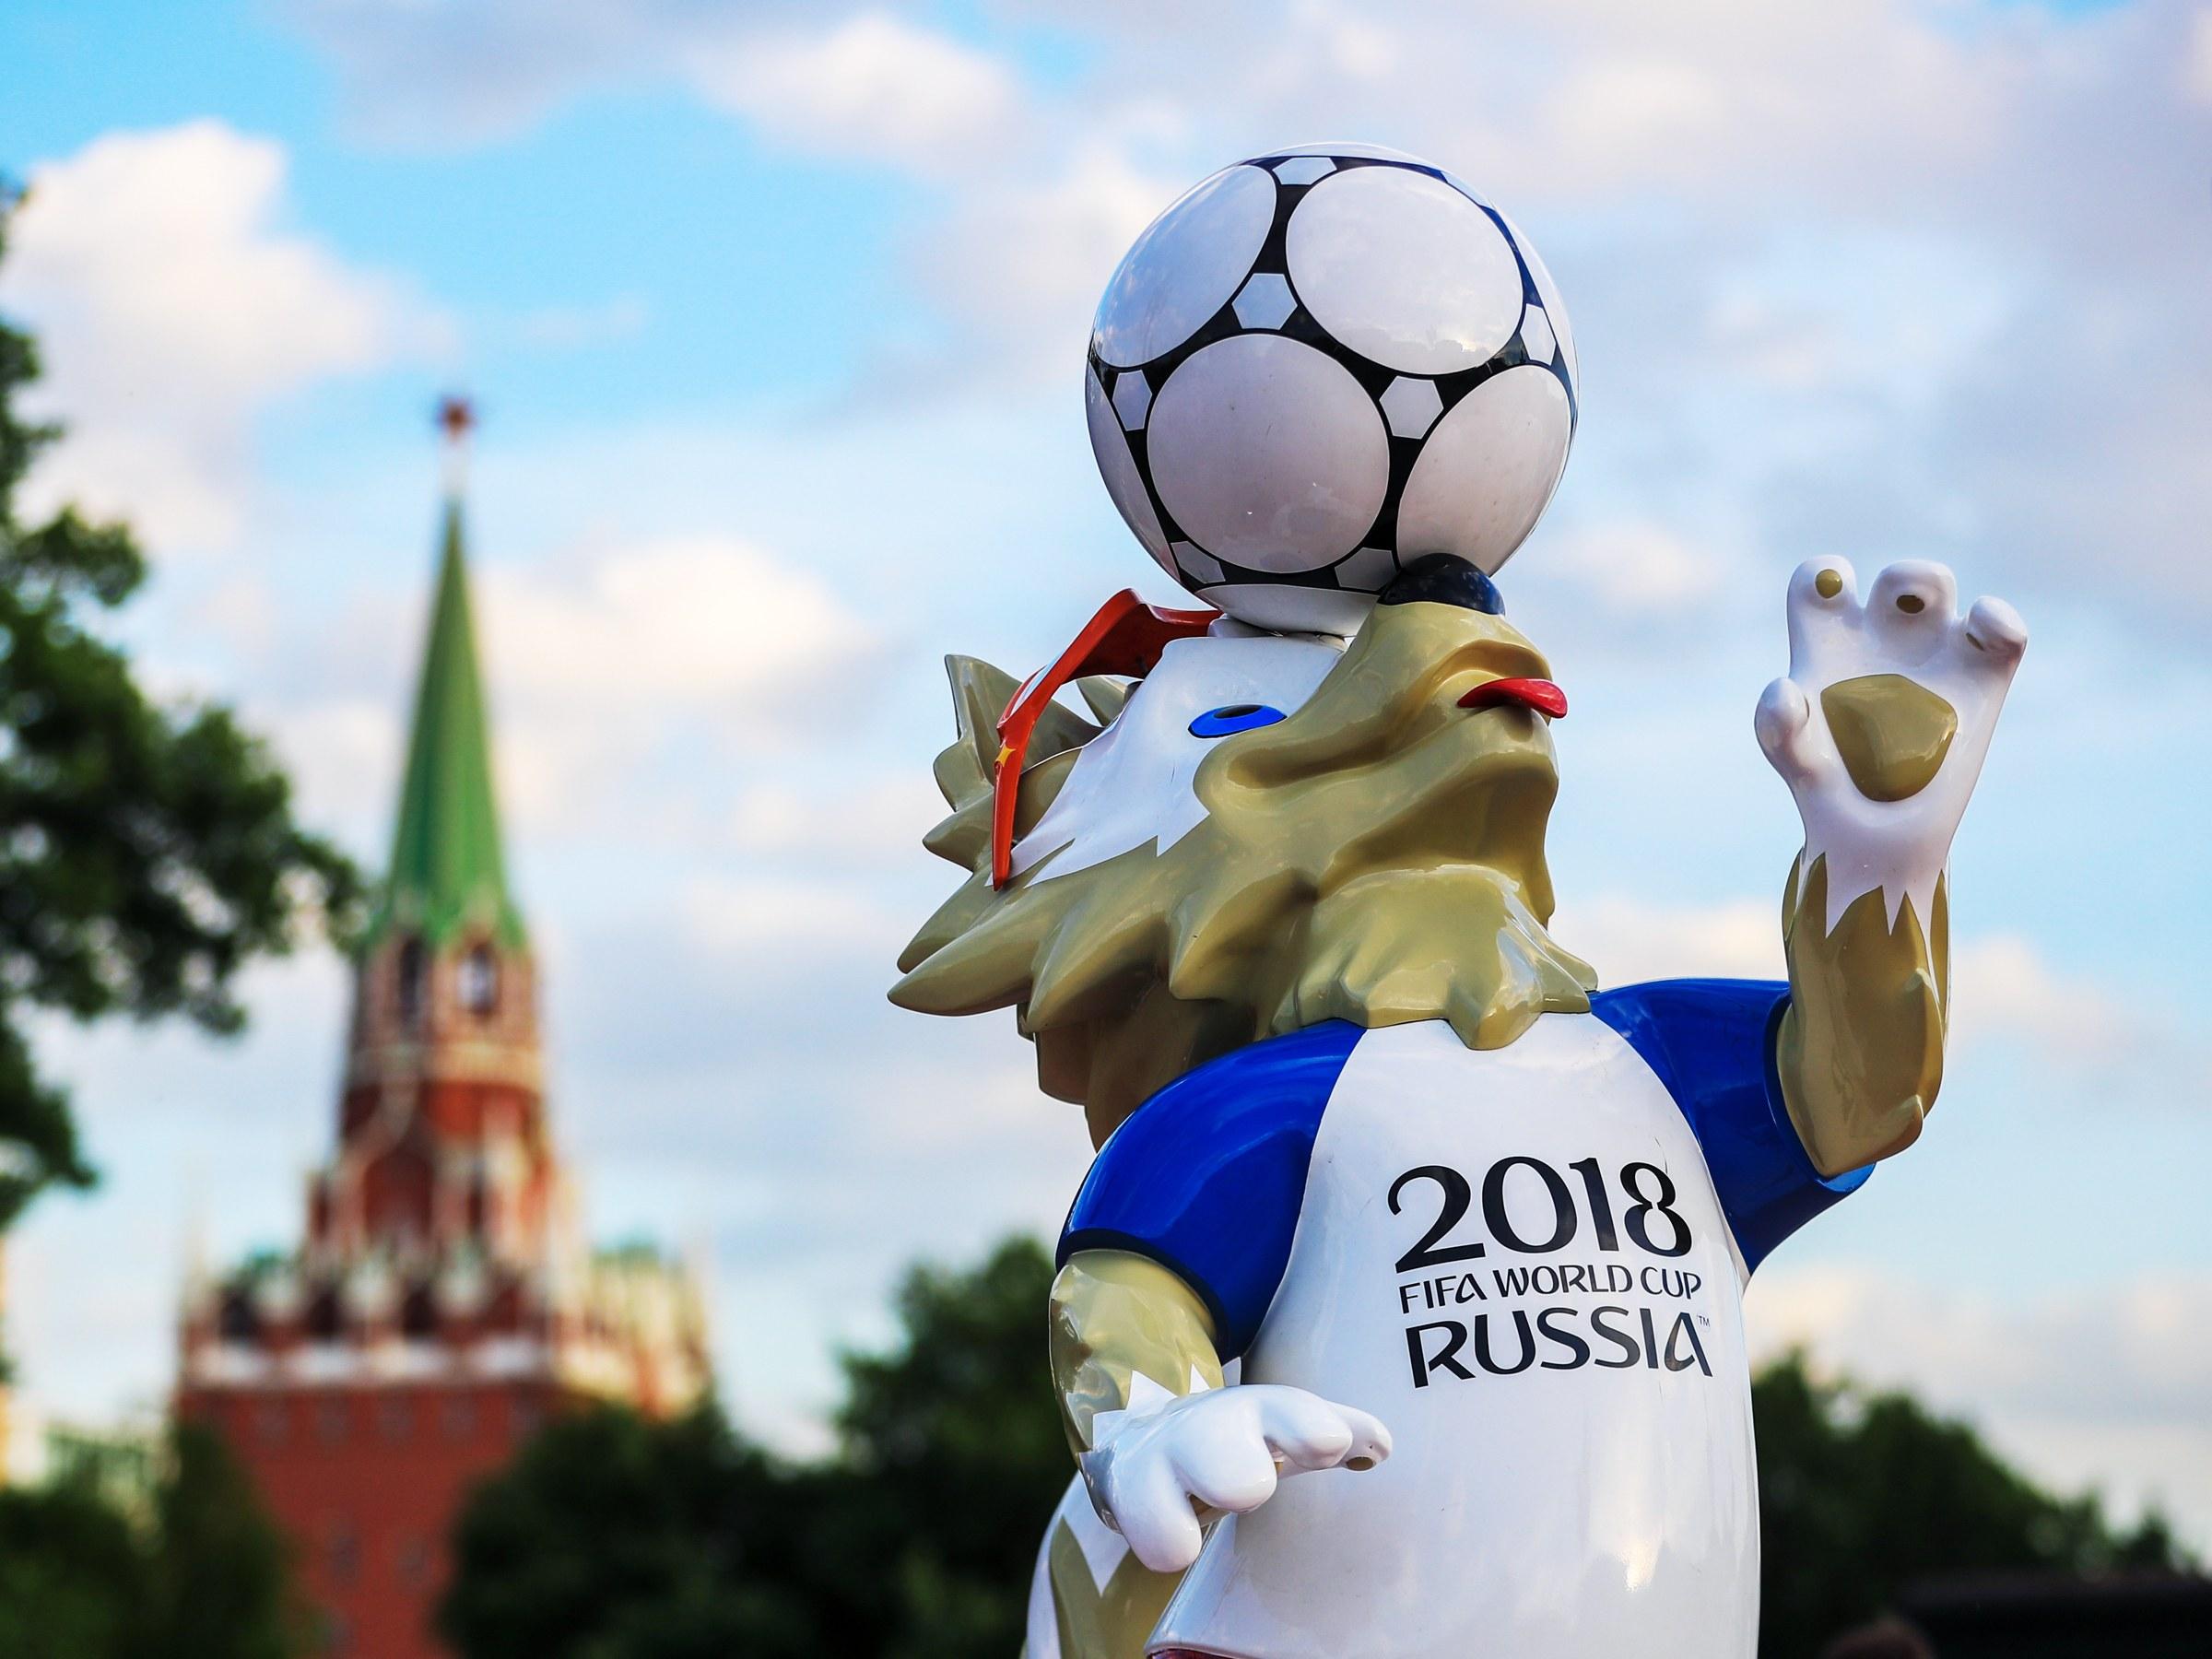 2018 fifa world cup russia - 1180×760